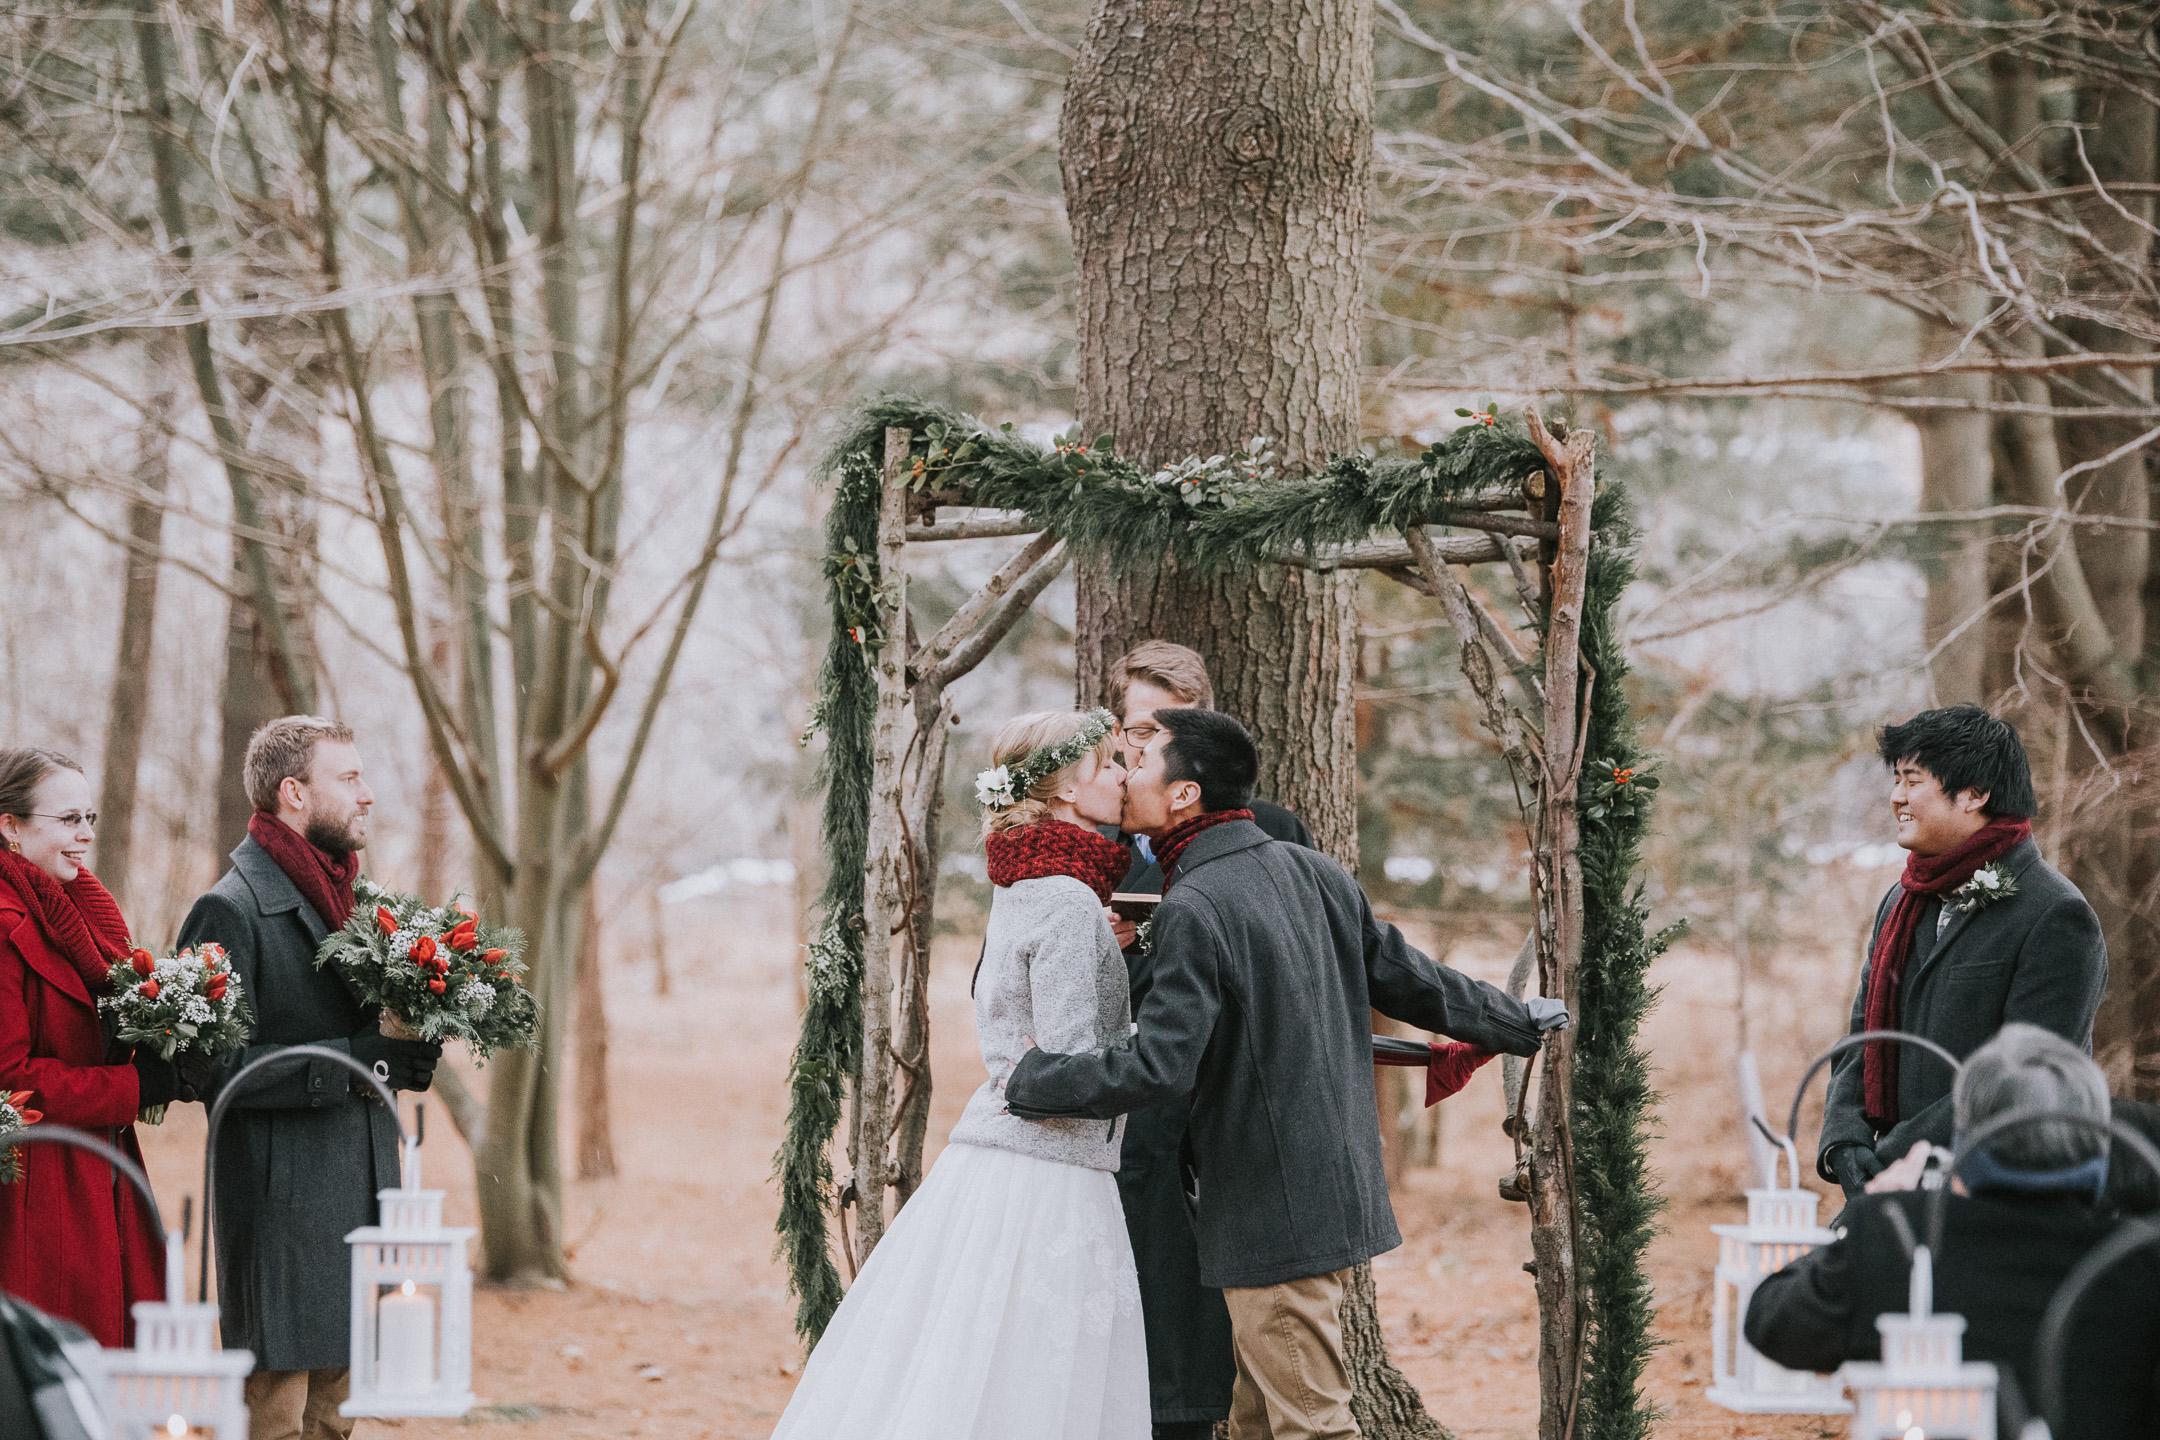 thurmont wedding photographer (31 of 38).jpg